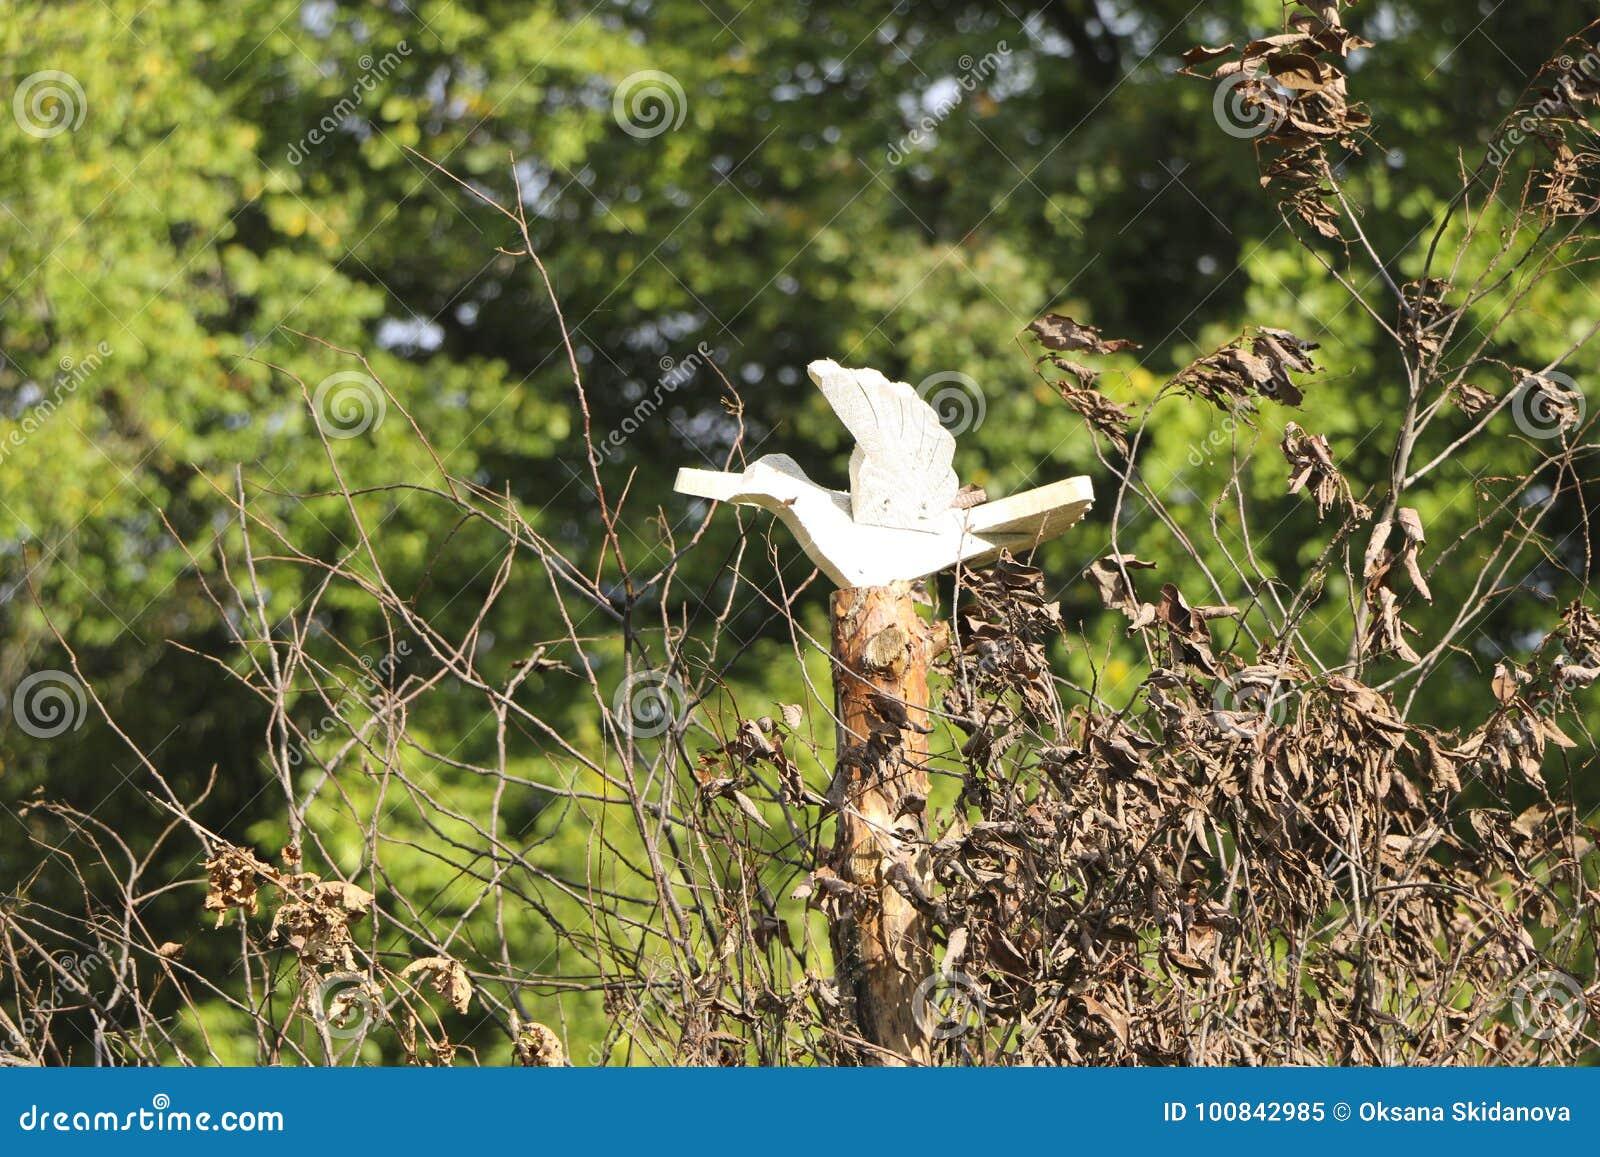 Wooden bird Slavic symbols